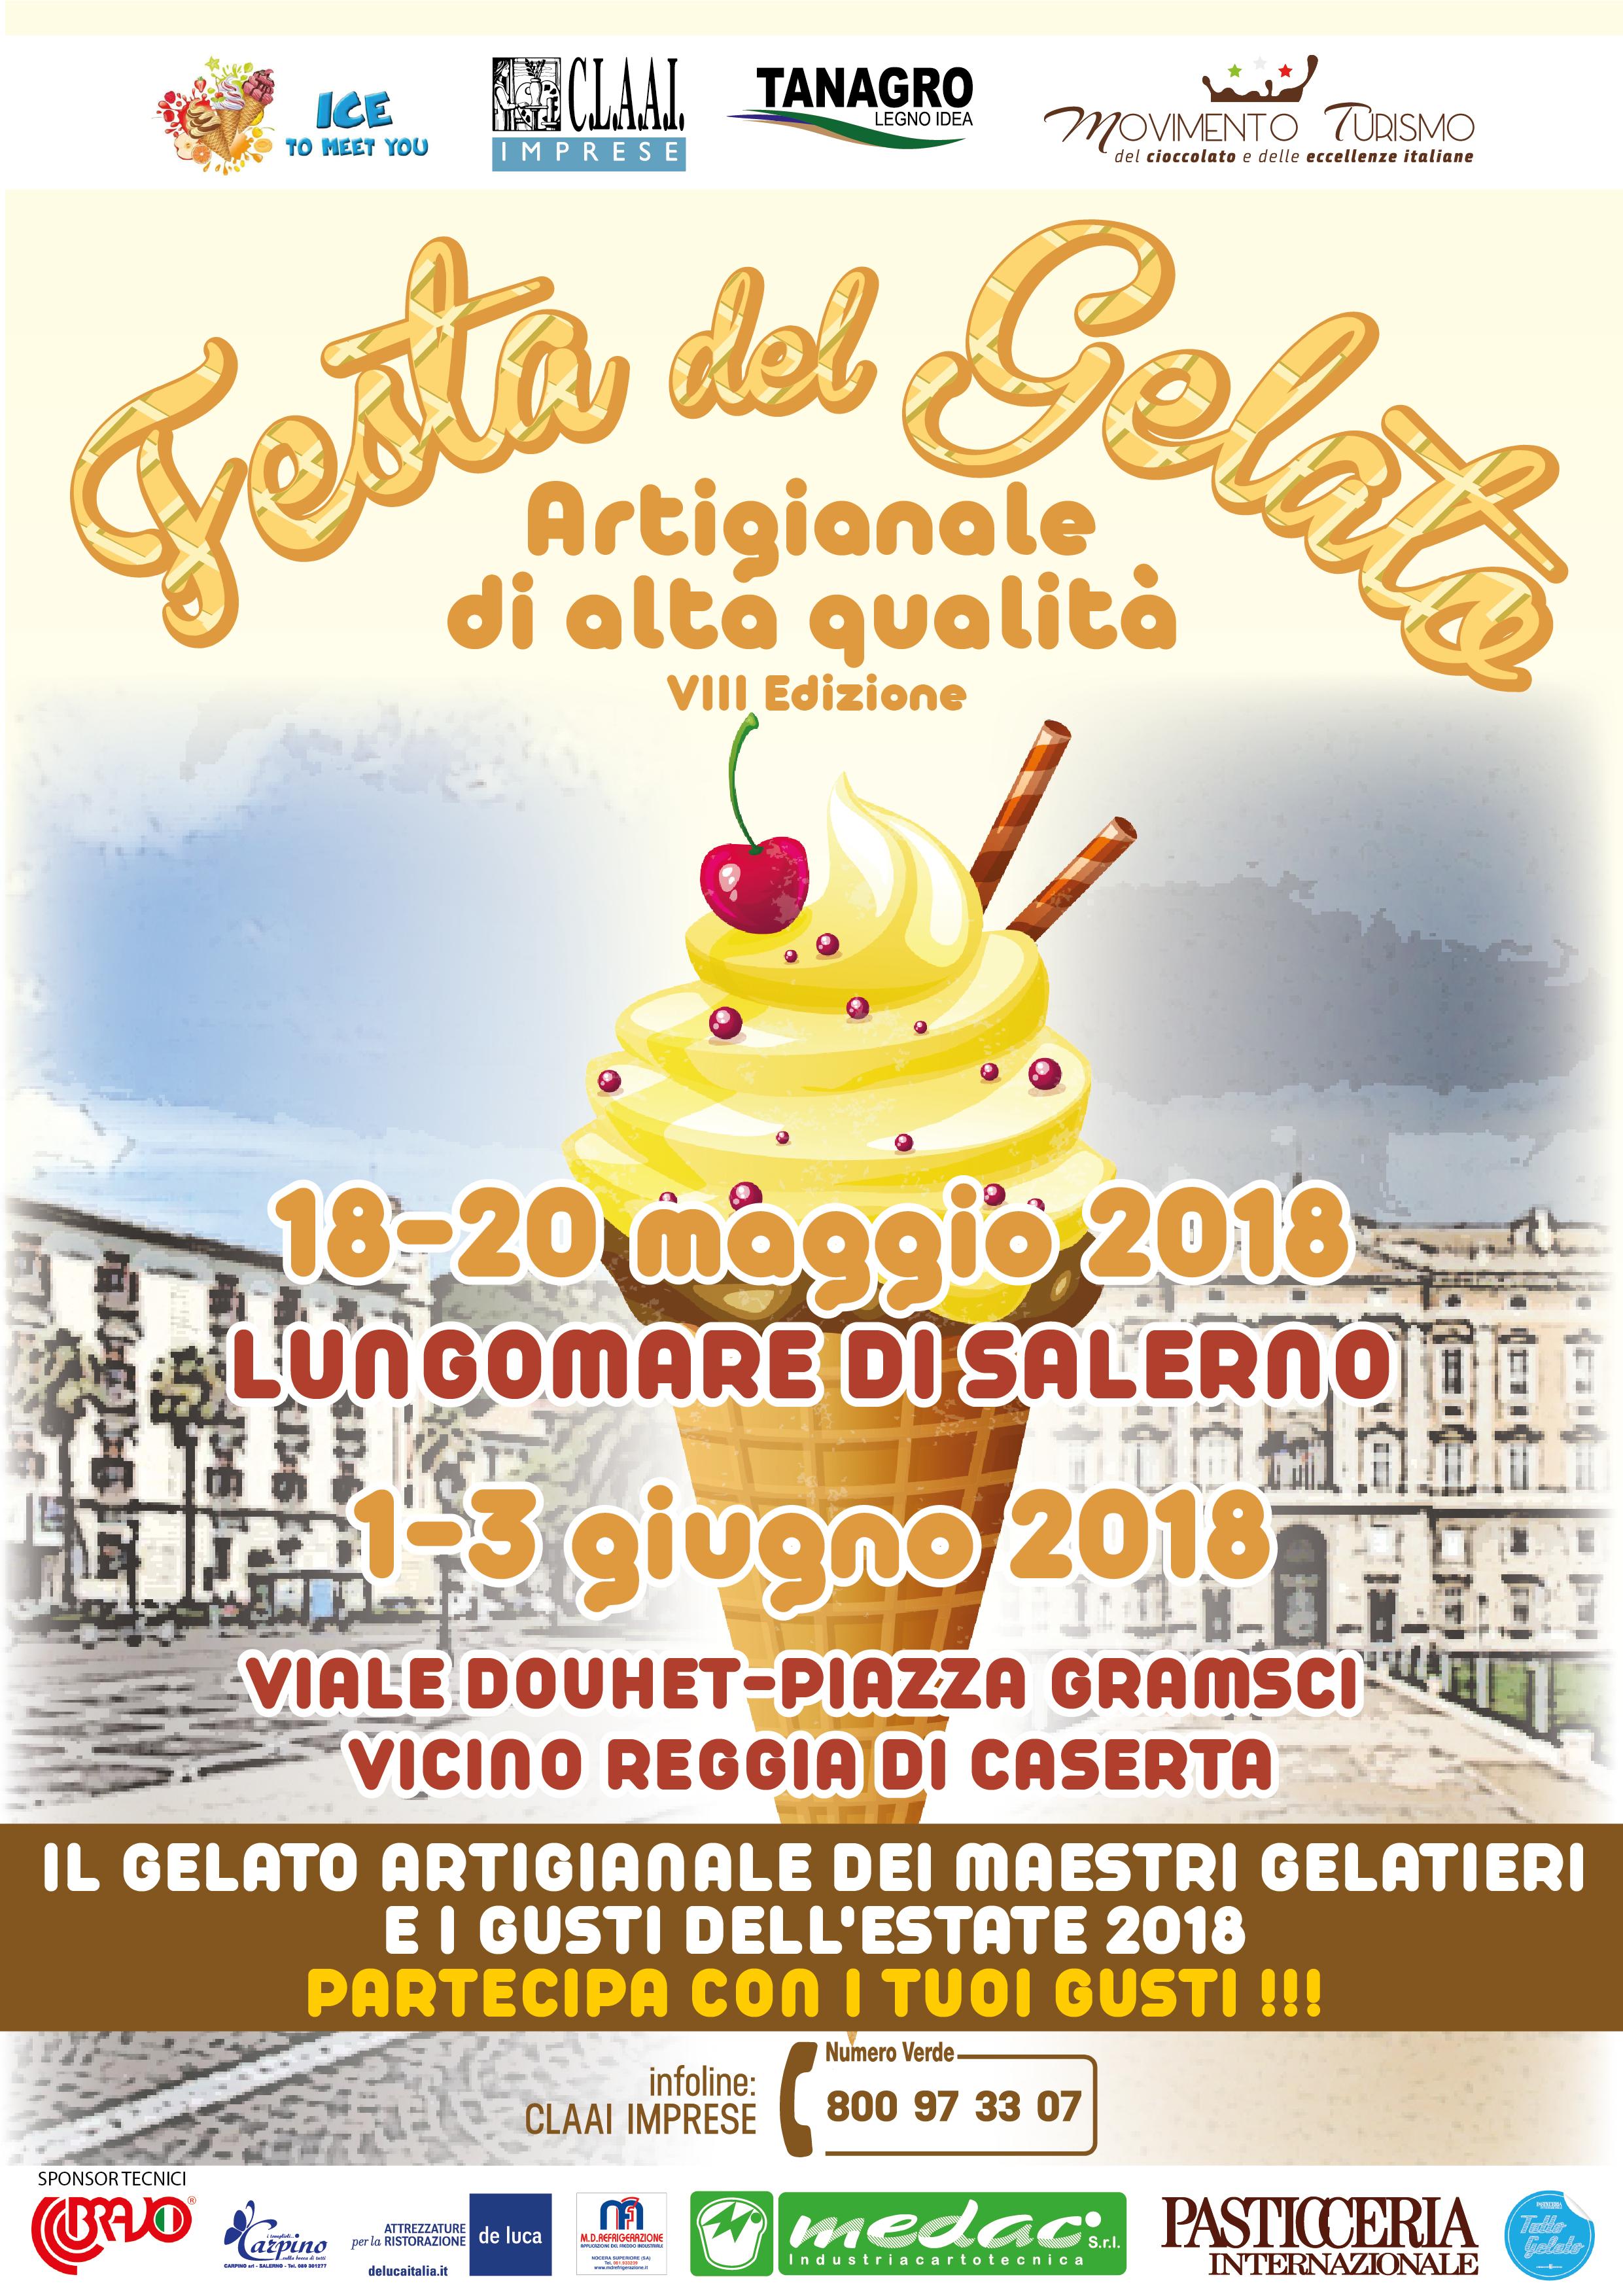 Ice to meet you - Festa del gelato artigianale a Salerno